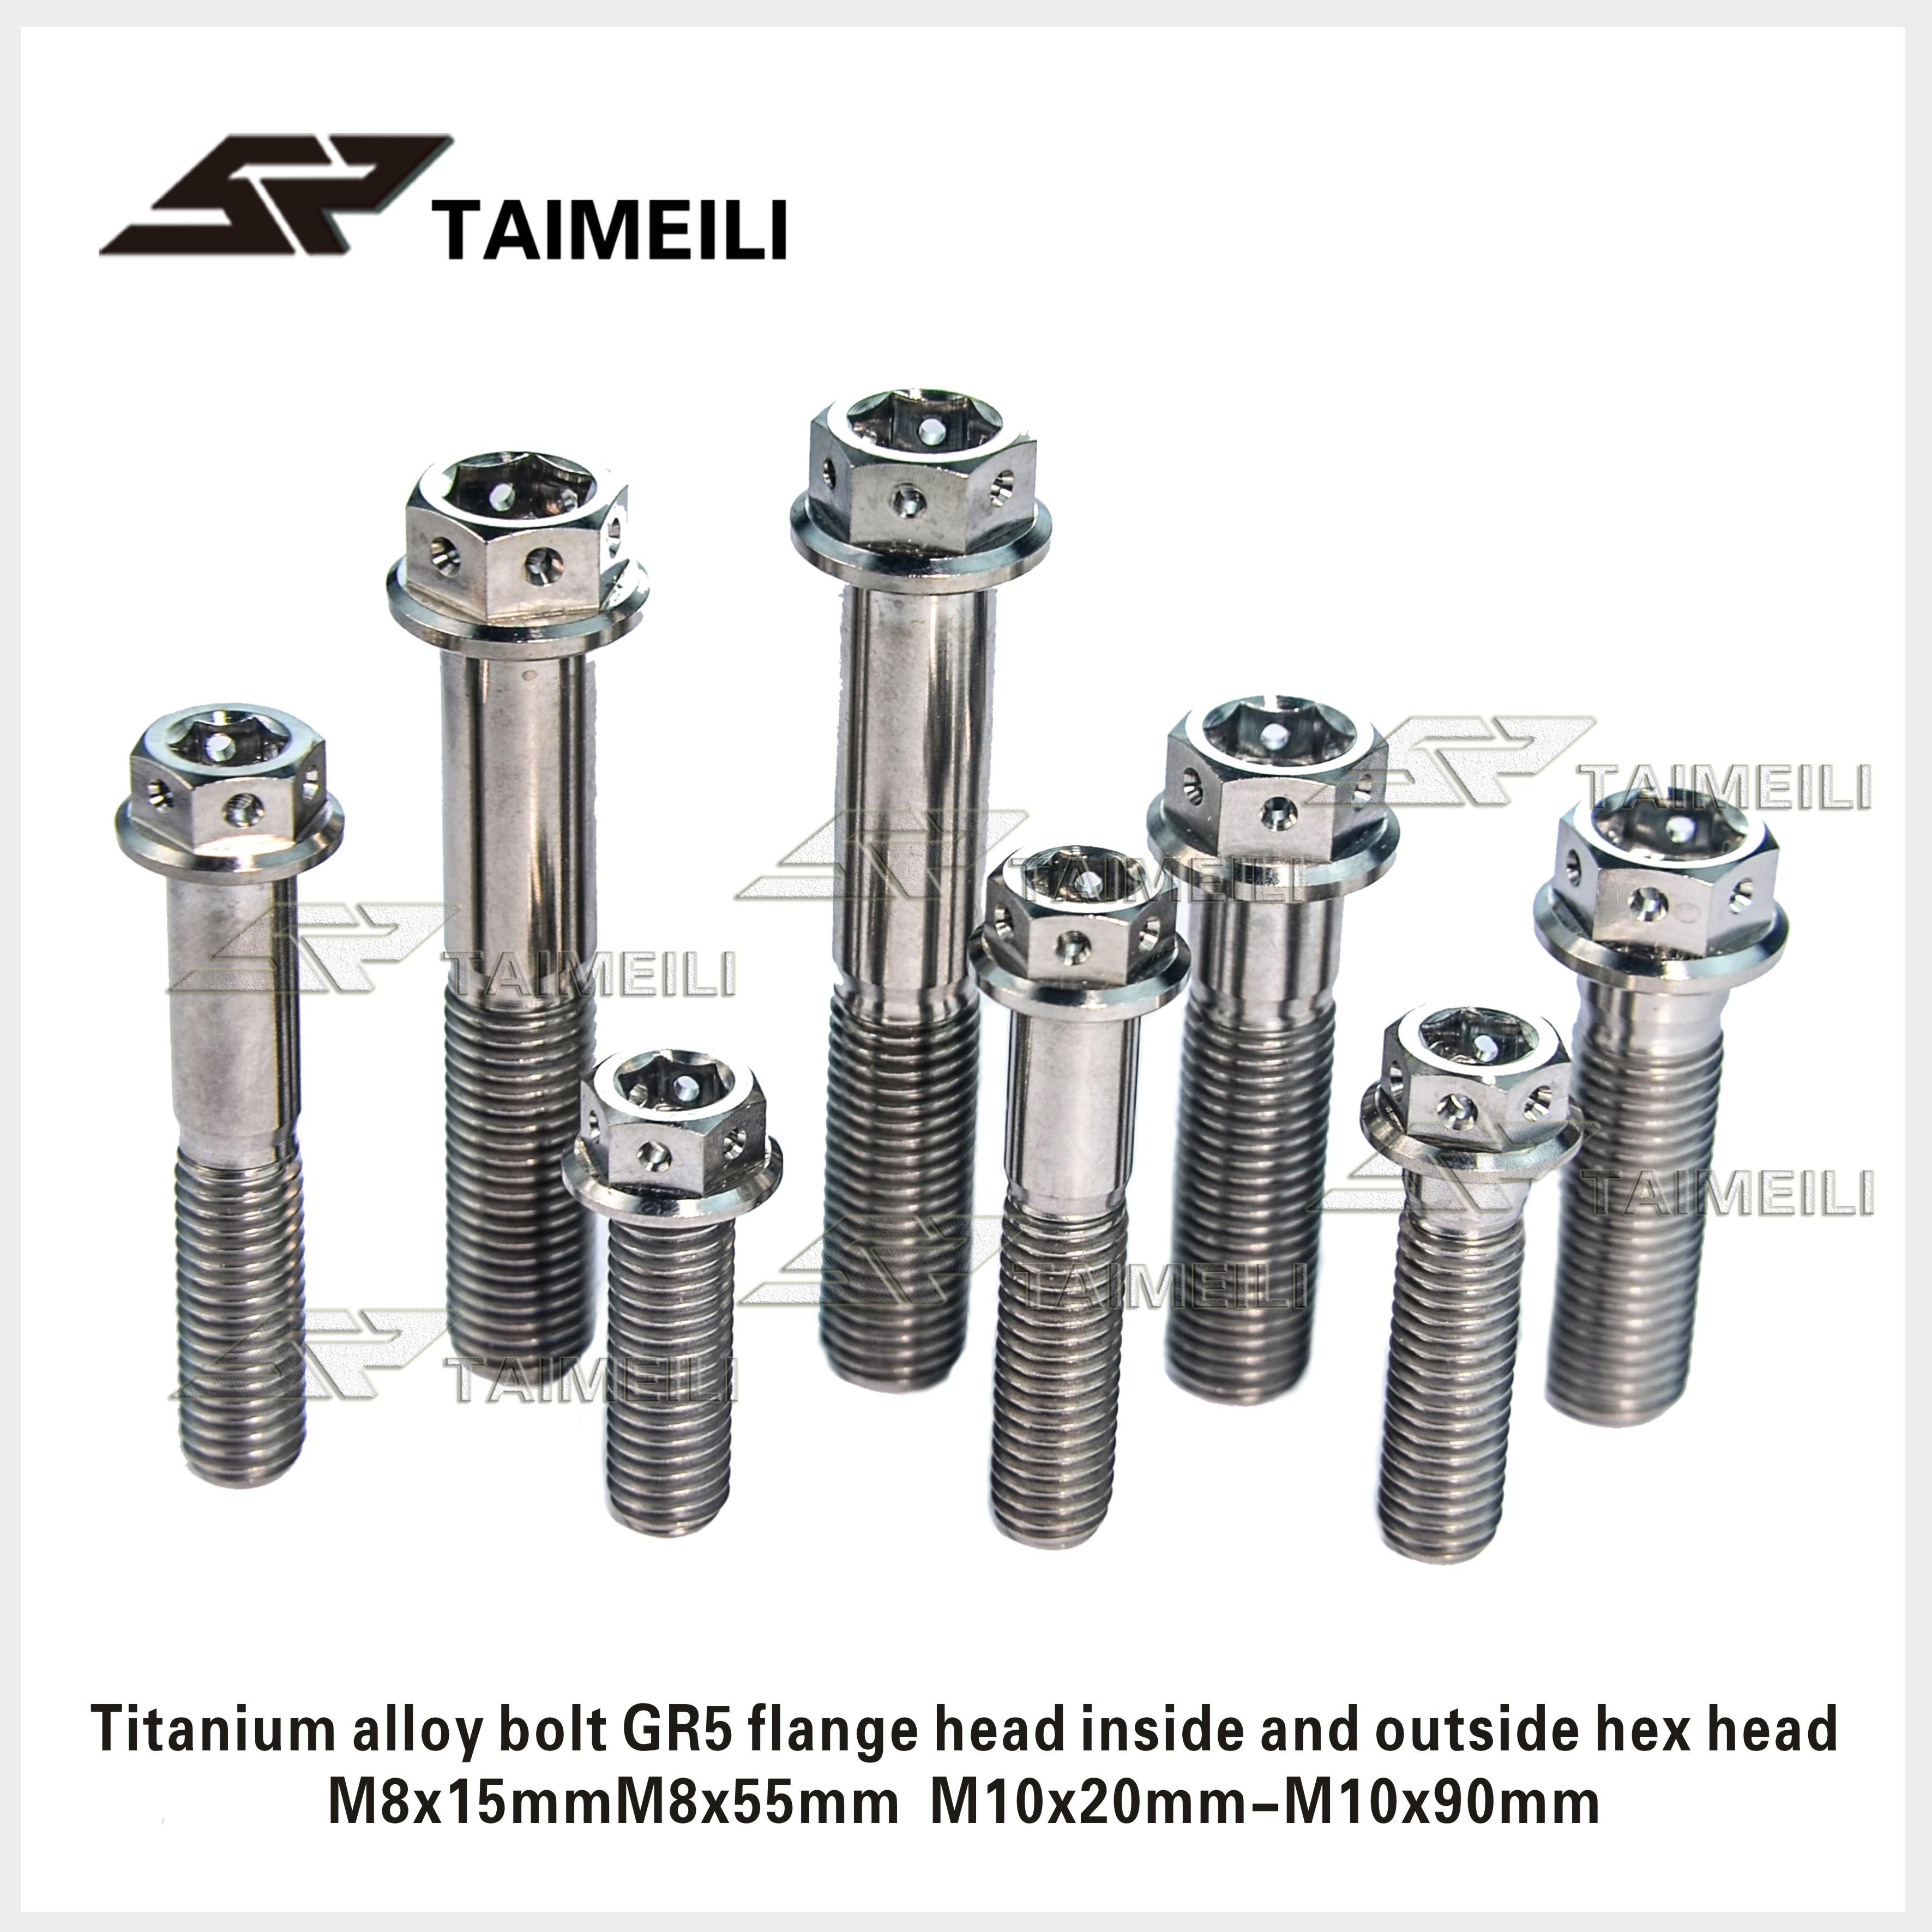 Titanyum cıvata GR5 flanş başlığı iç ve dış altıgen başlı M8 M10x20-90mm motosiklet refitted cıvata onarım yedek scre